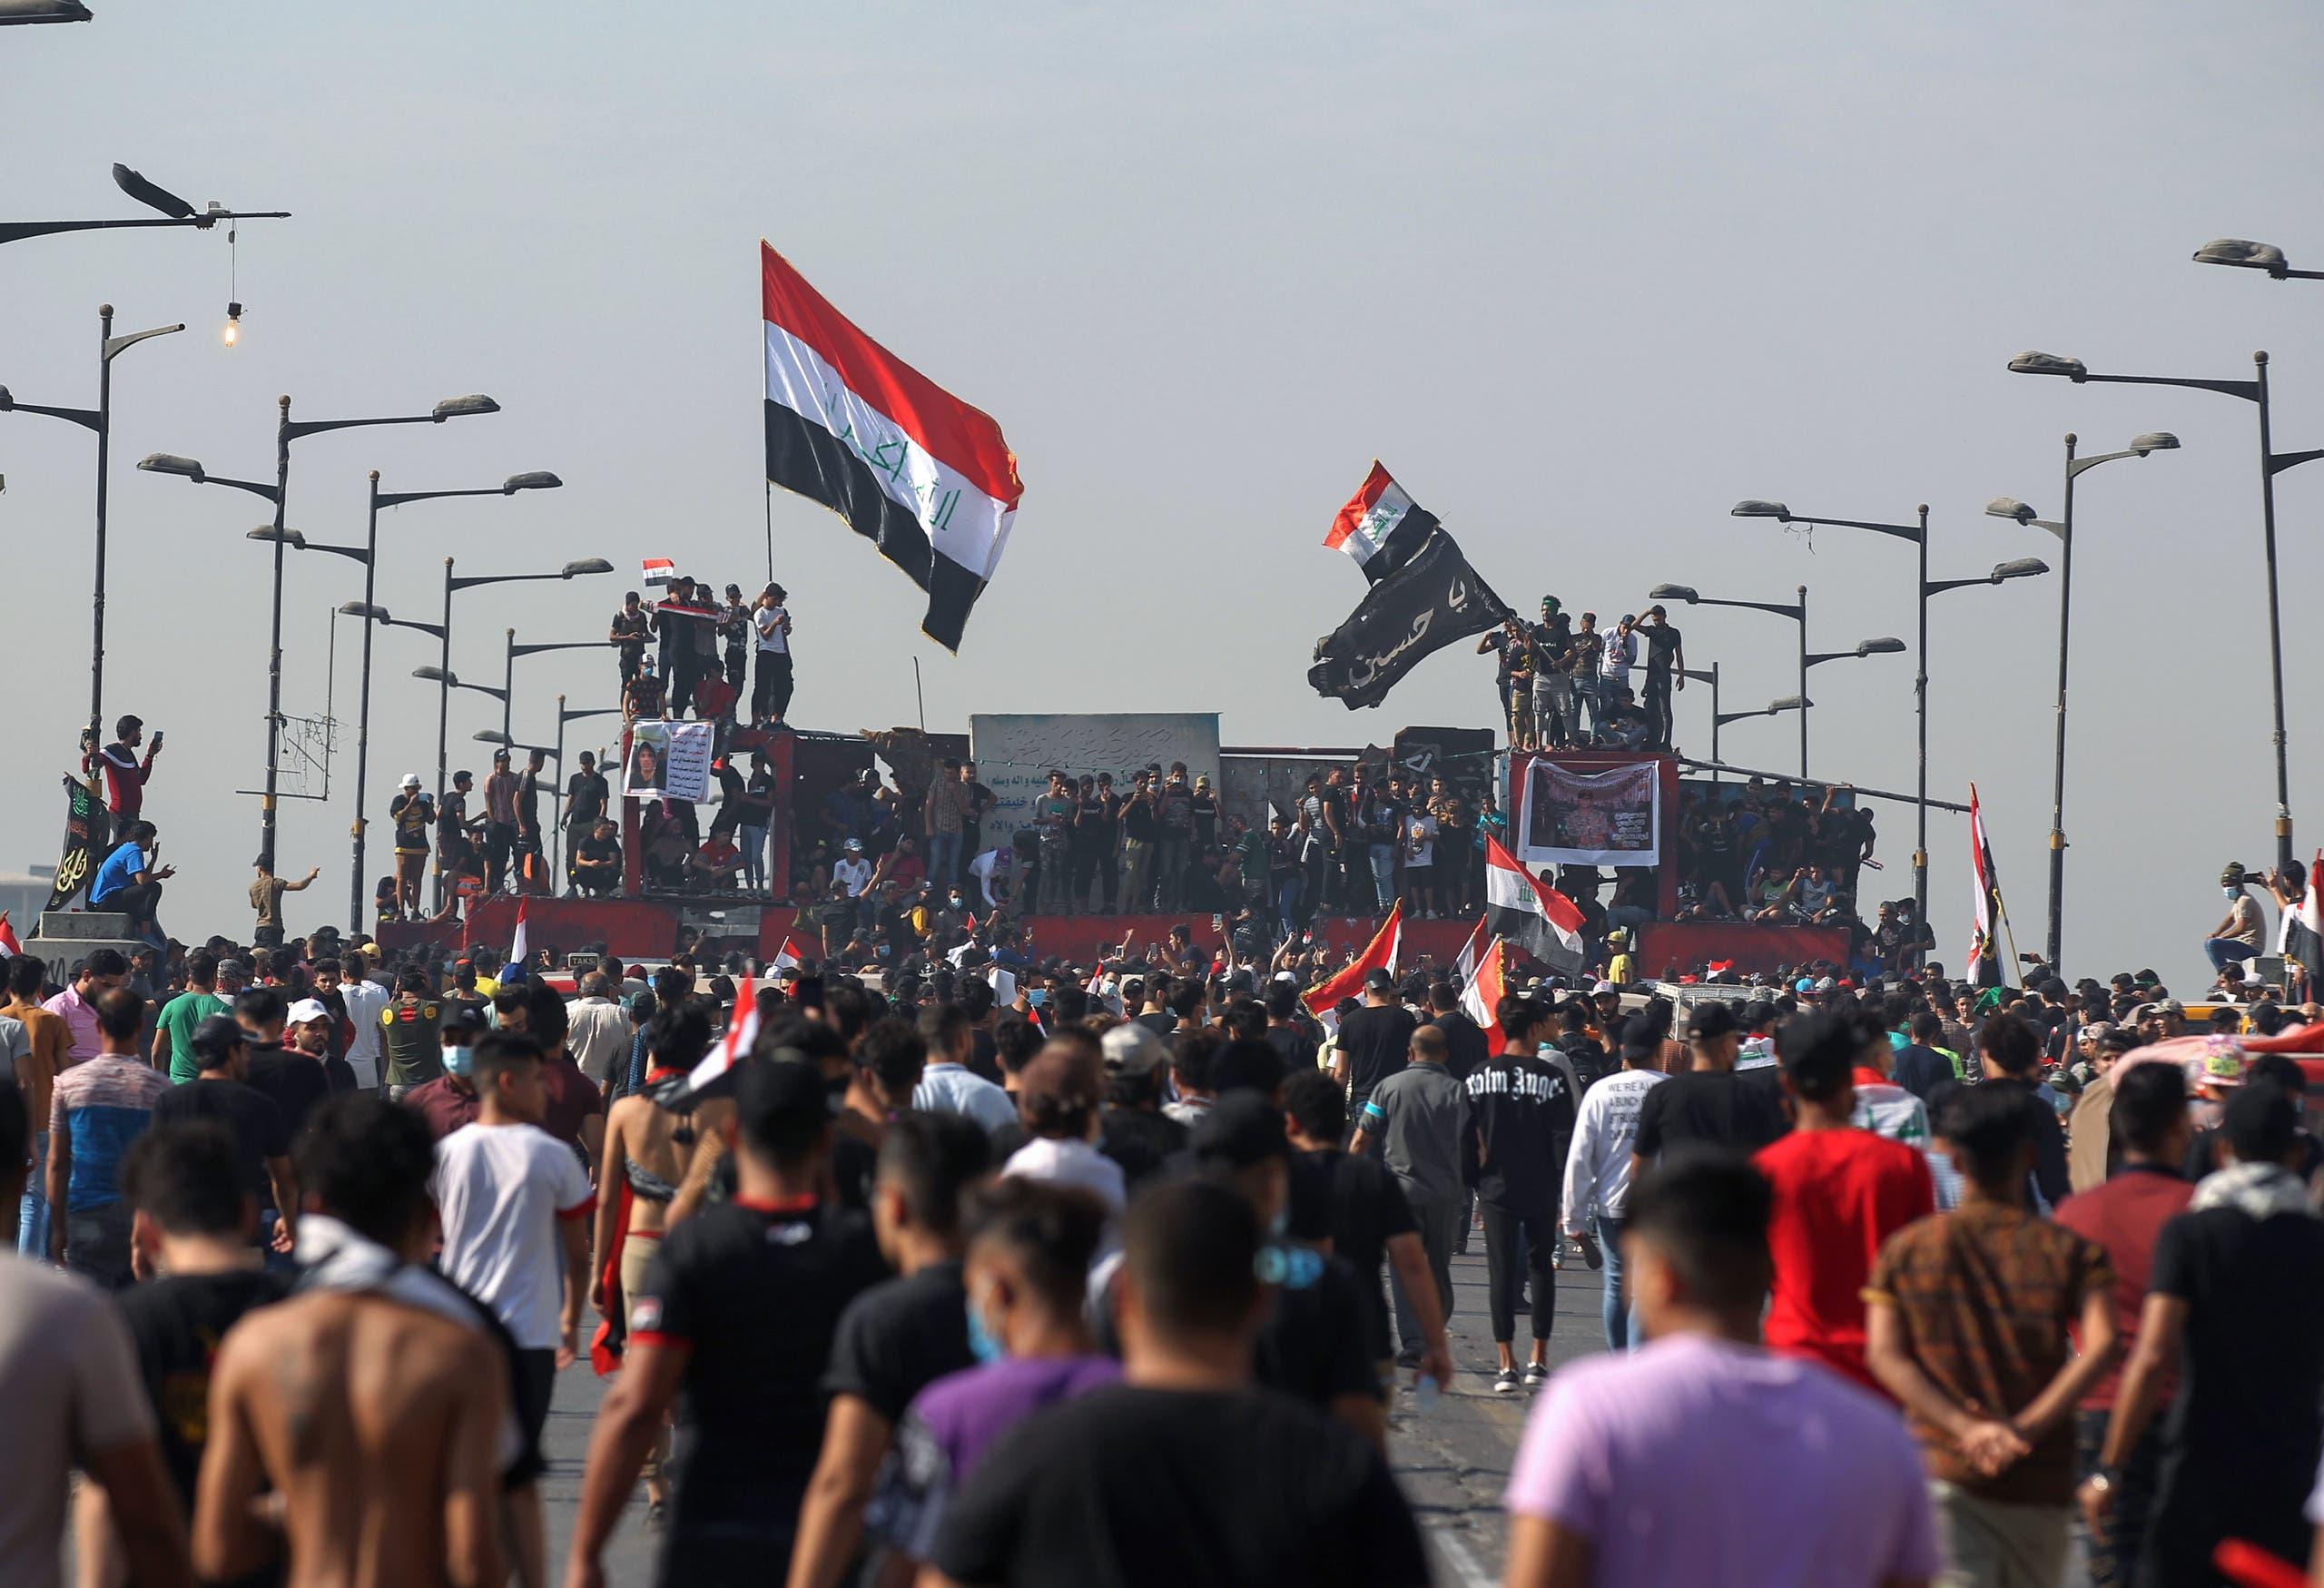 Iraqi protesters gather on Al-Jumhuriya Bridge in the capital Baghdad on October 25, 2020. (AFP)